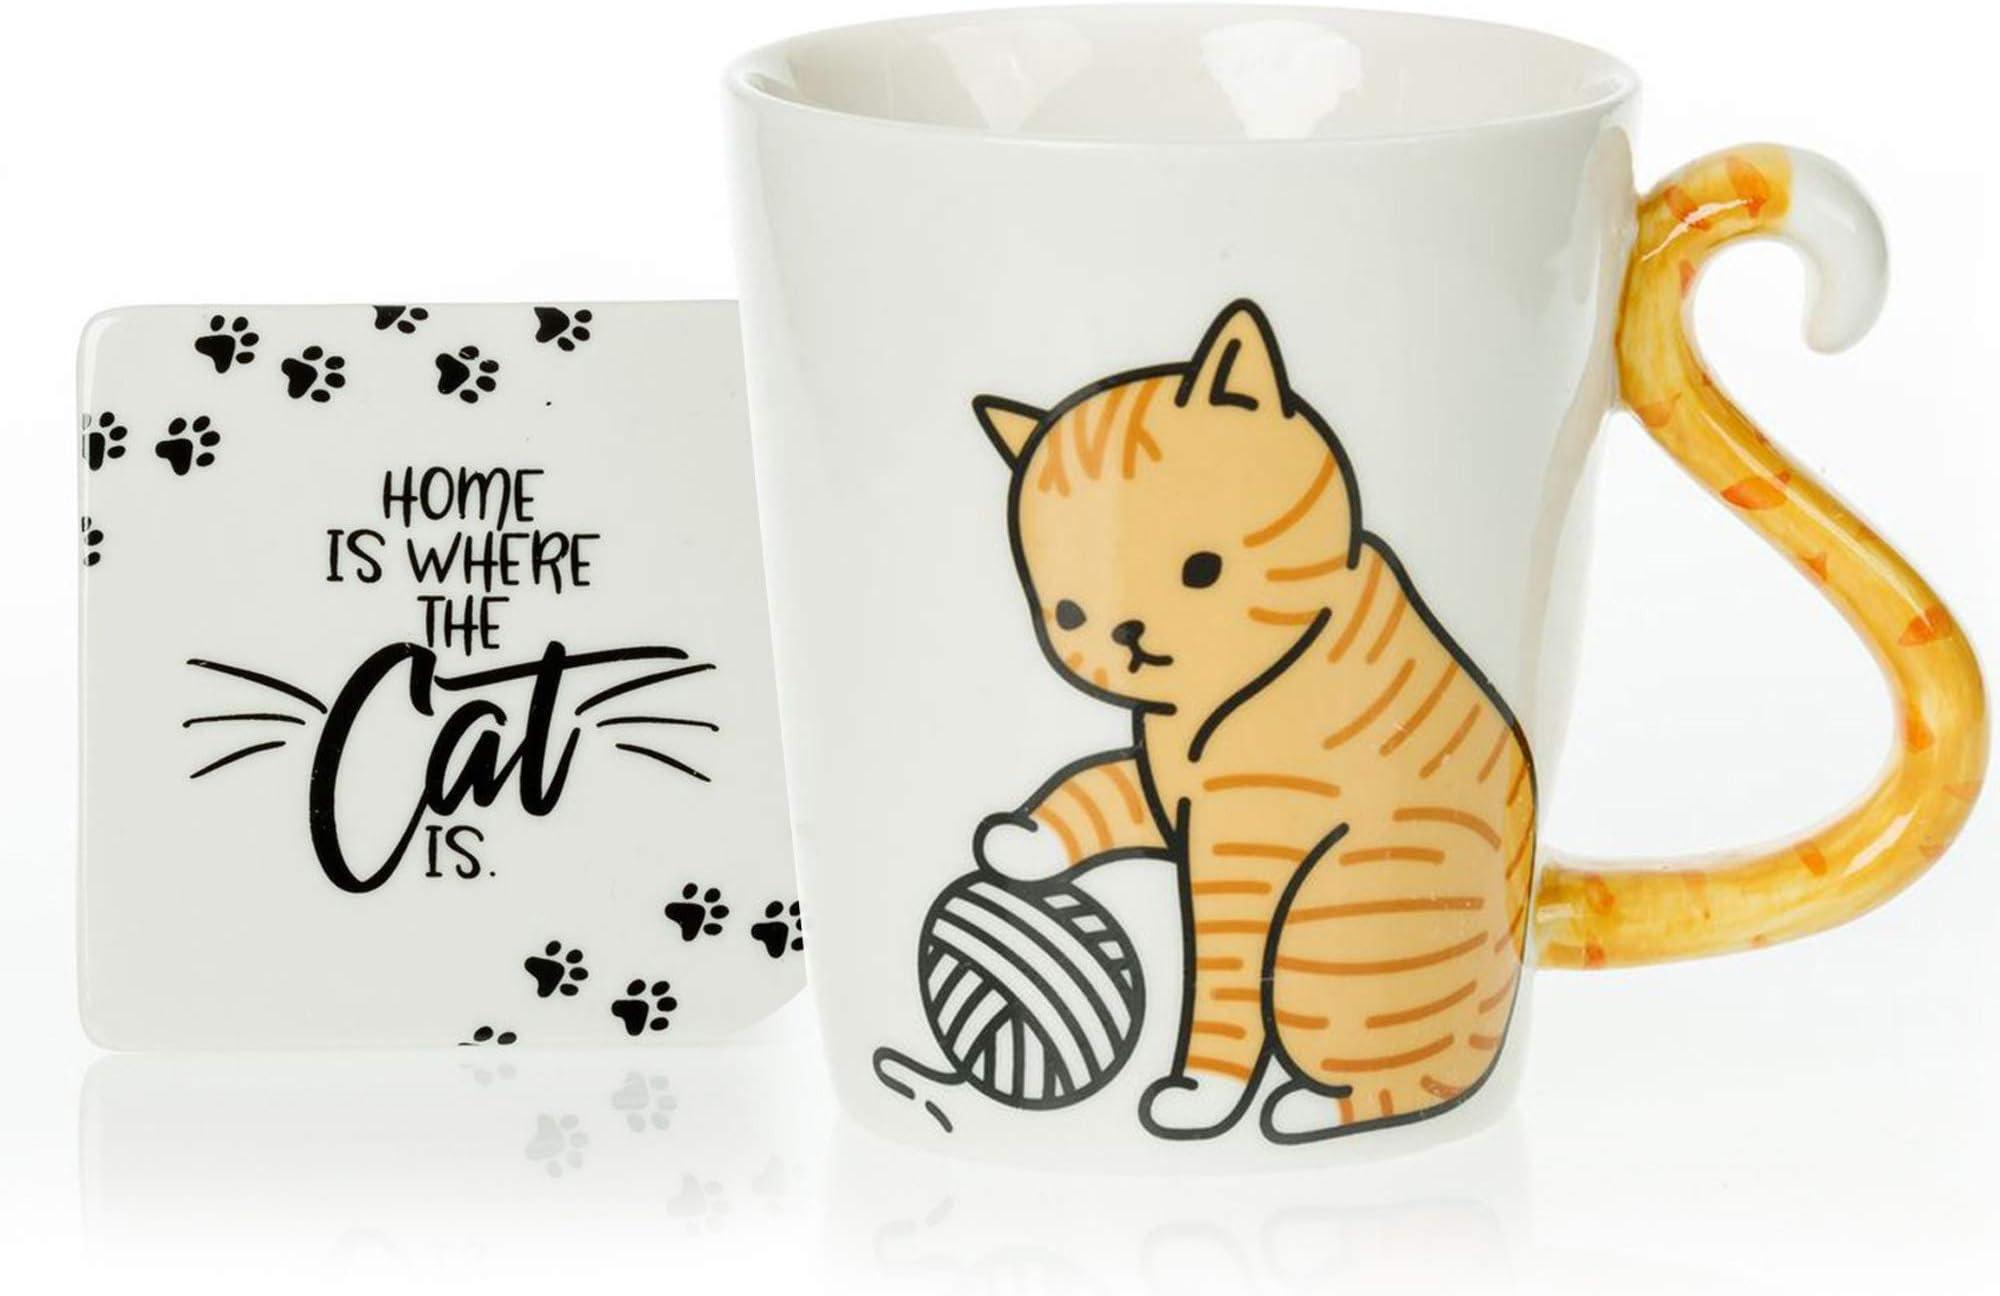 InFLOATables Orange Cat Mug and Coaster Set - Cute Mug with Ceramic Coaster - 3D Coffee Mug with Tail Cat Handle - Novelty Coffee Mugs - Tabby Cat Mug - Holds 12 Ounces of Drink